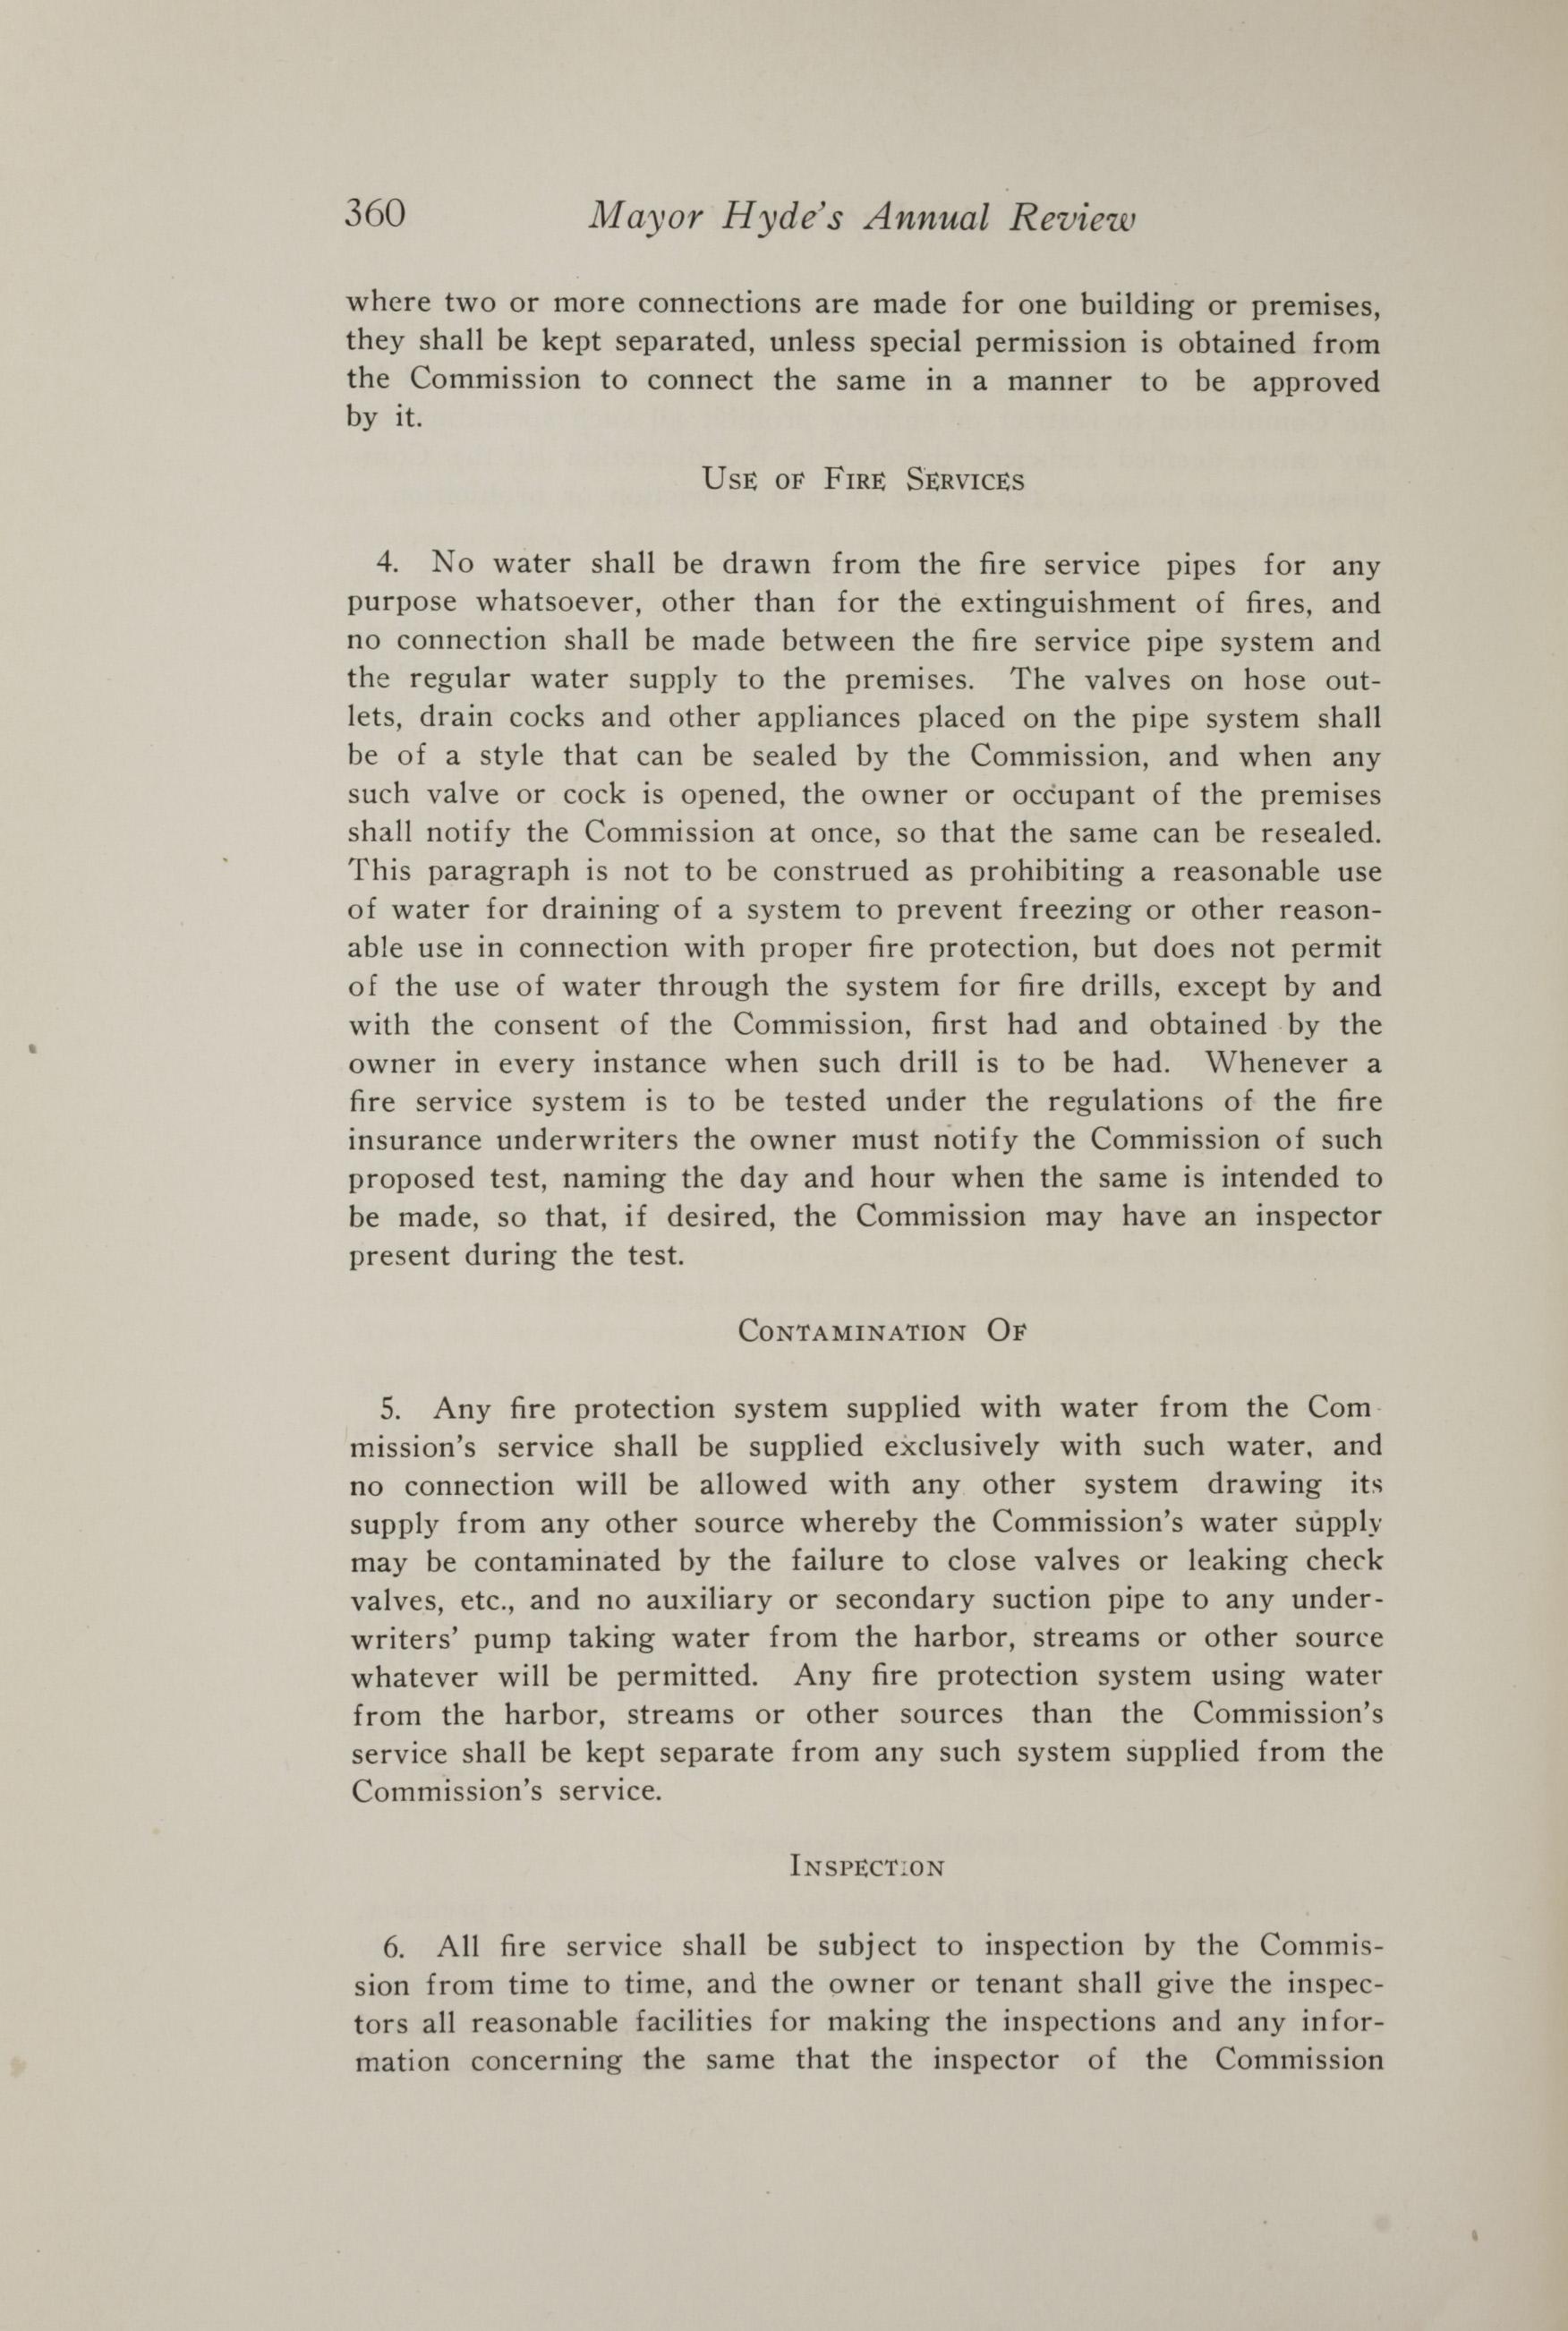 Charleston Yearbook, 1917, page 360